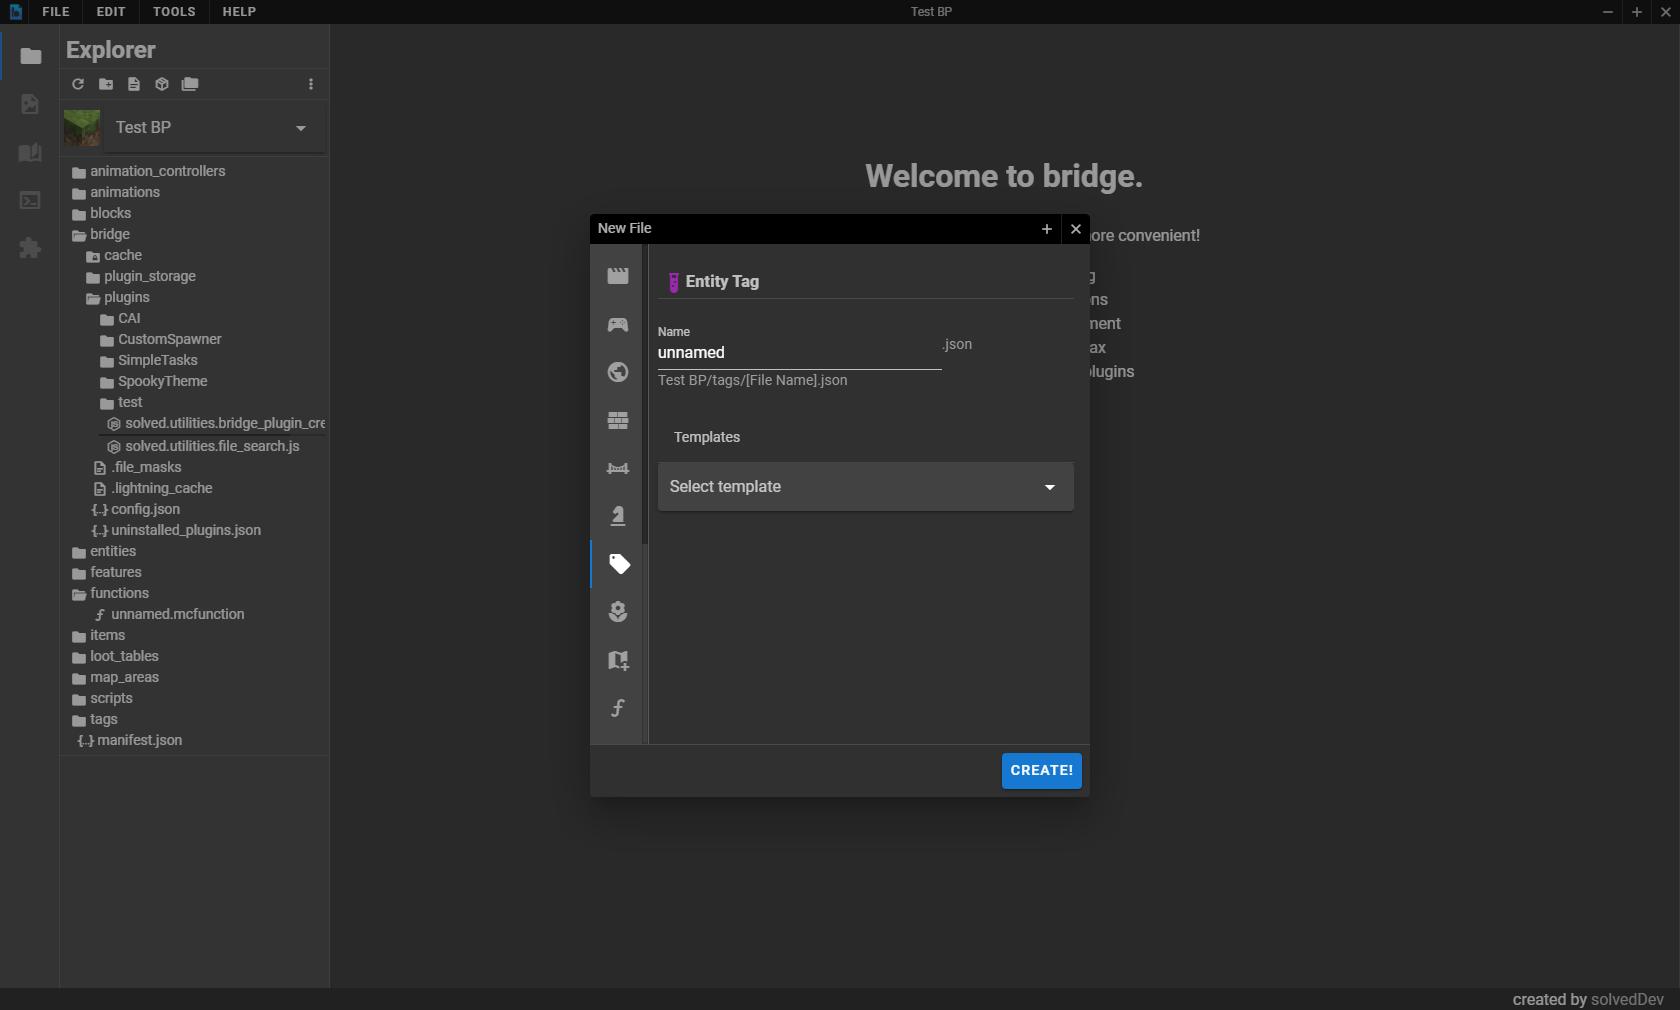 bridge. file creation